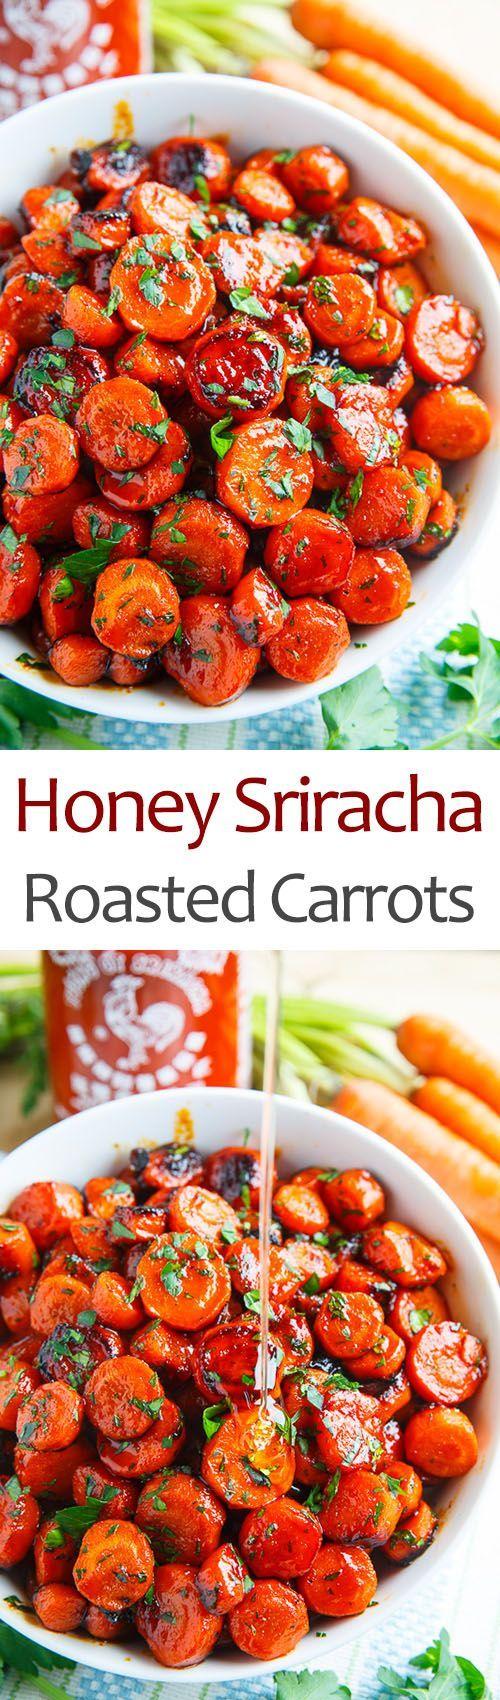 Honey Sriracha Roasted Carrots Vegetable Side Dish Recipe via Closet Cooking